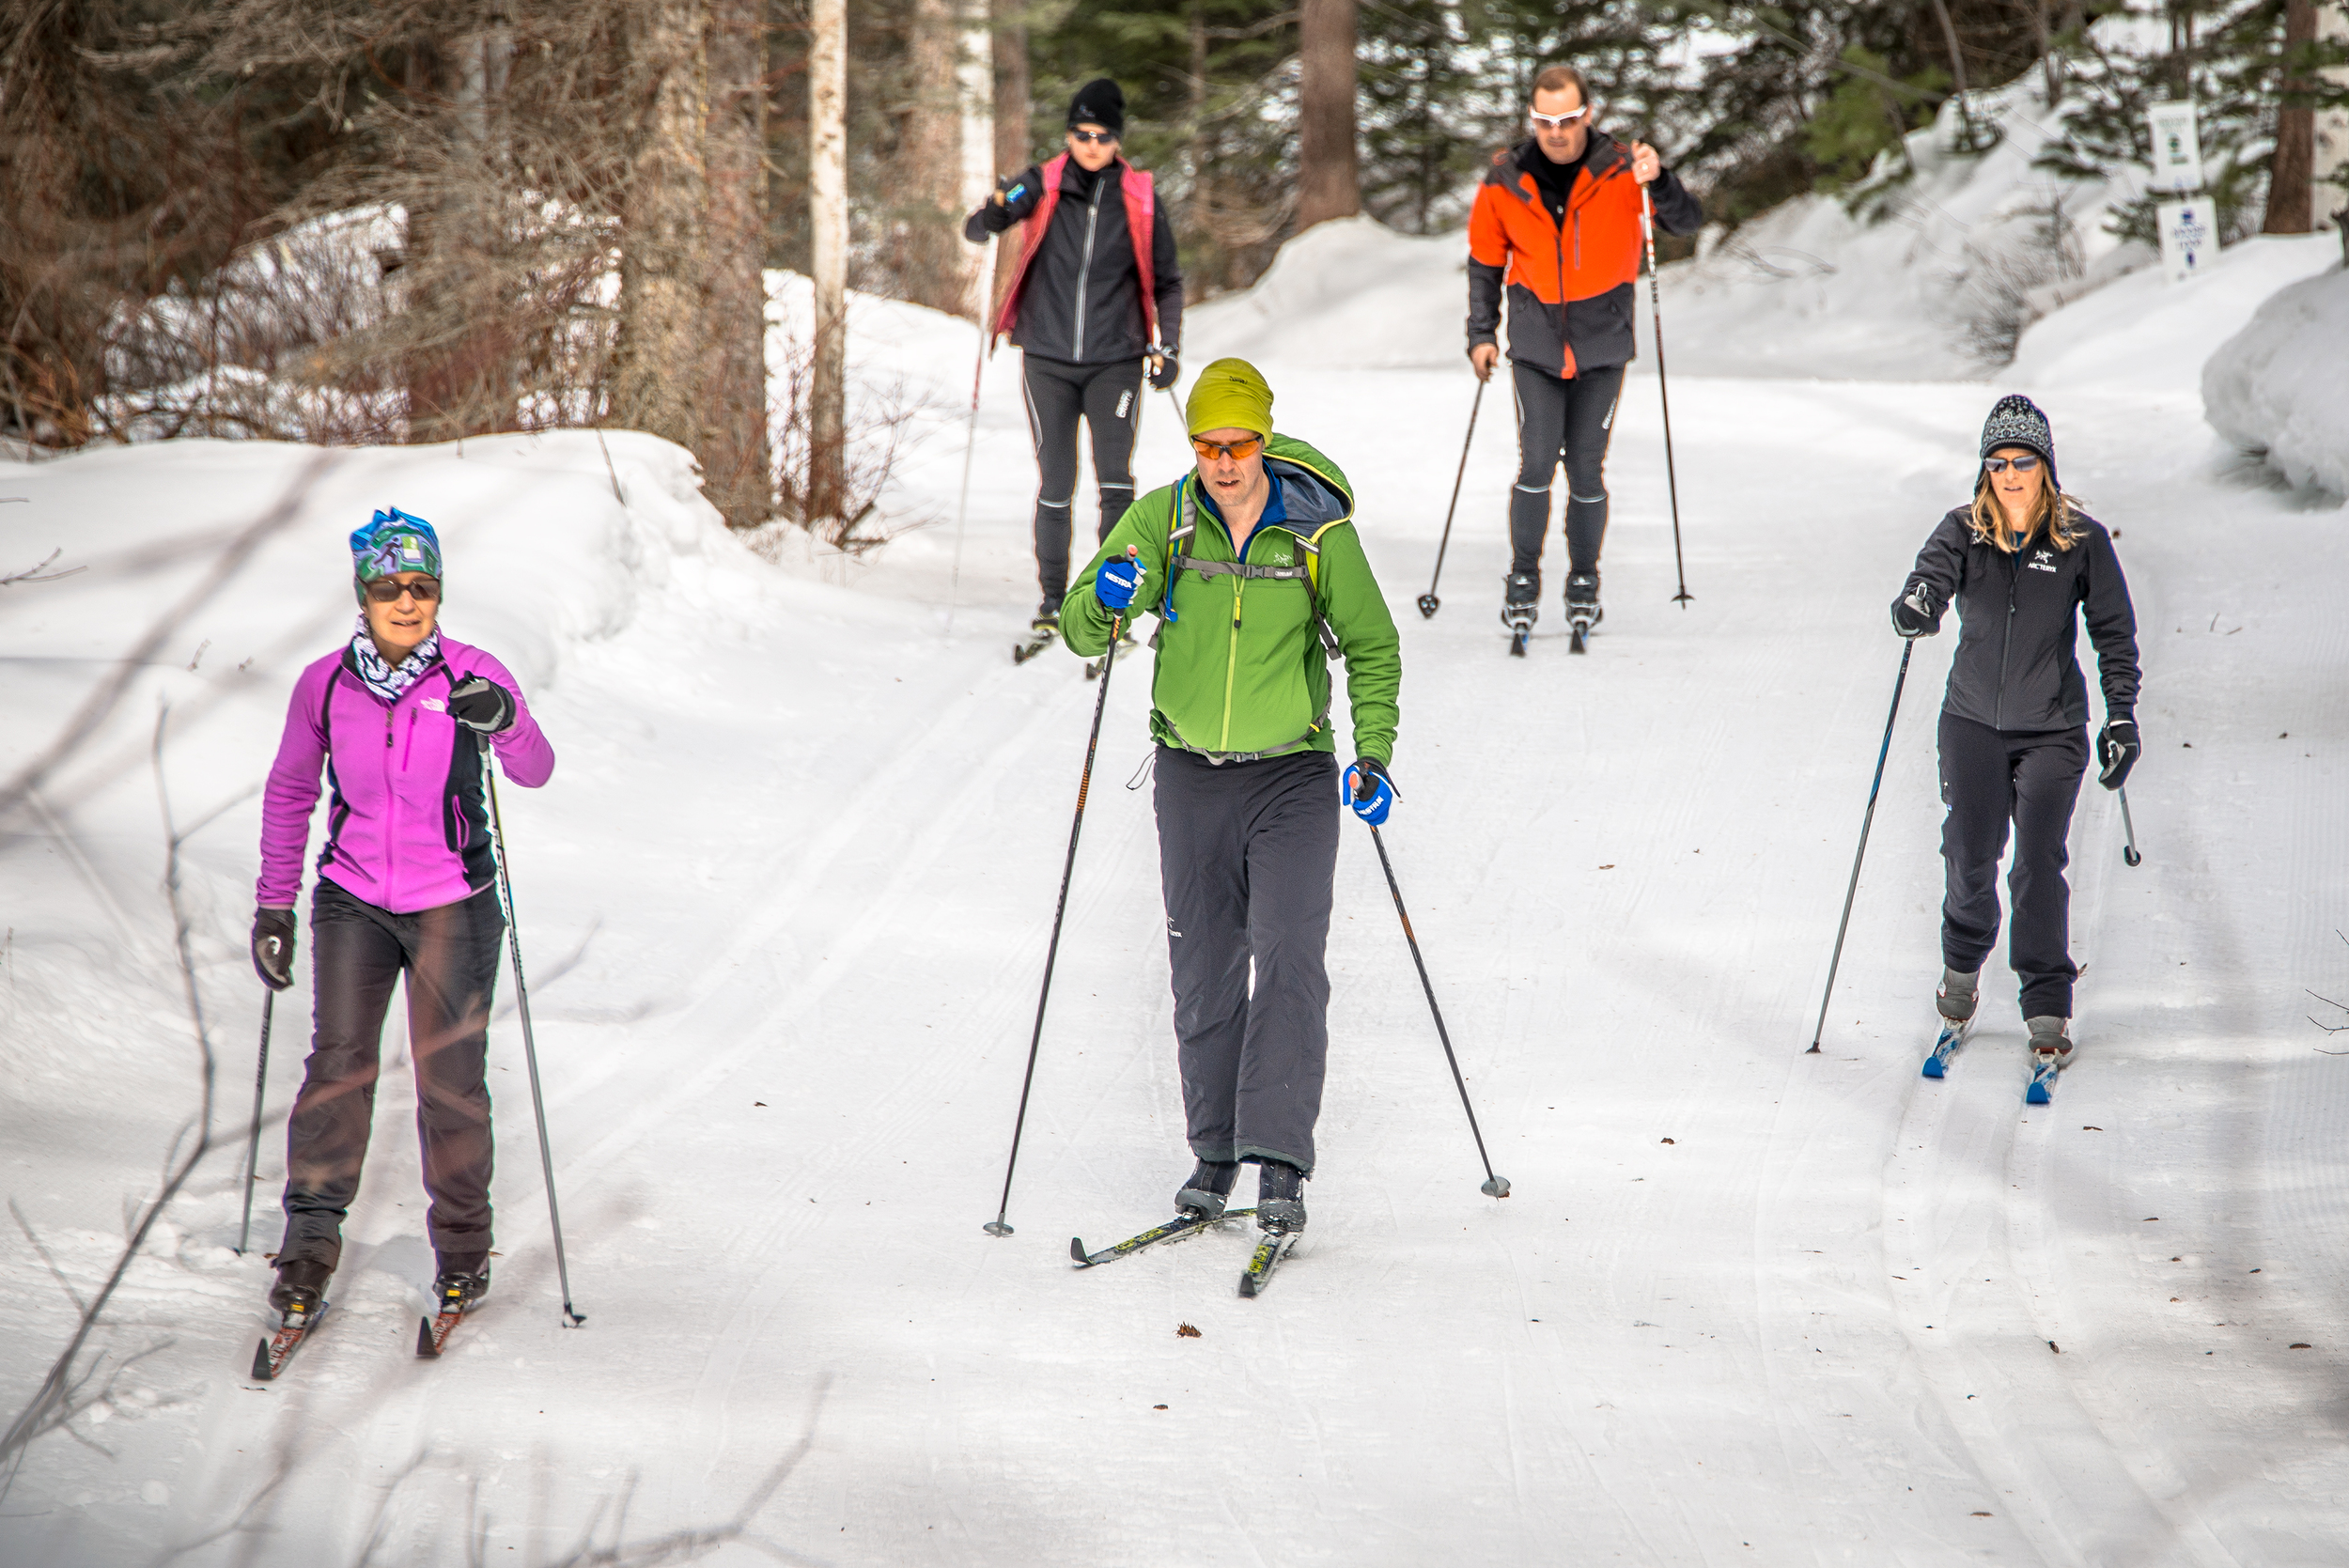 Sunshine and ski trails